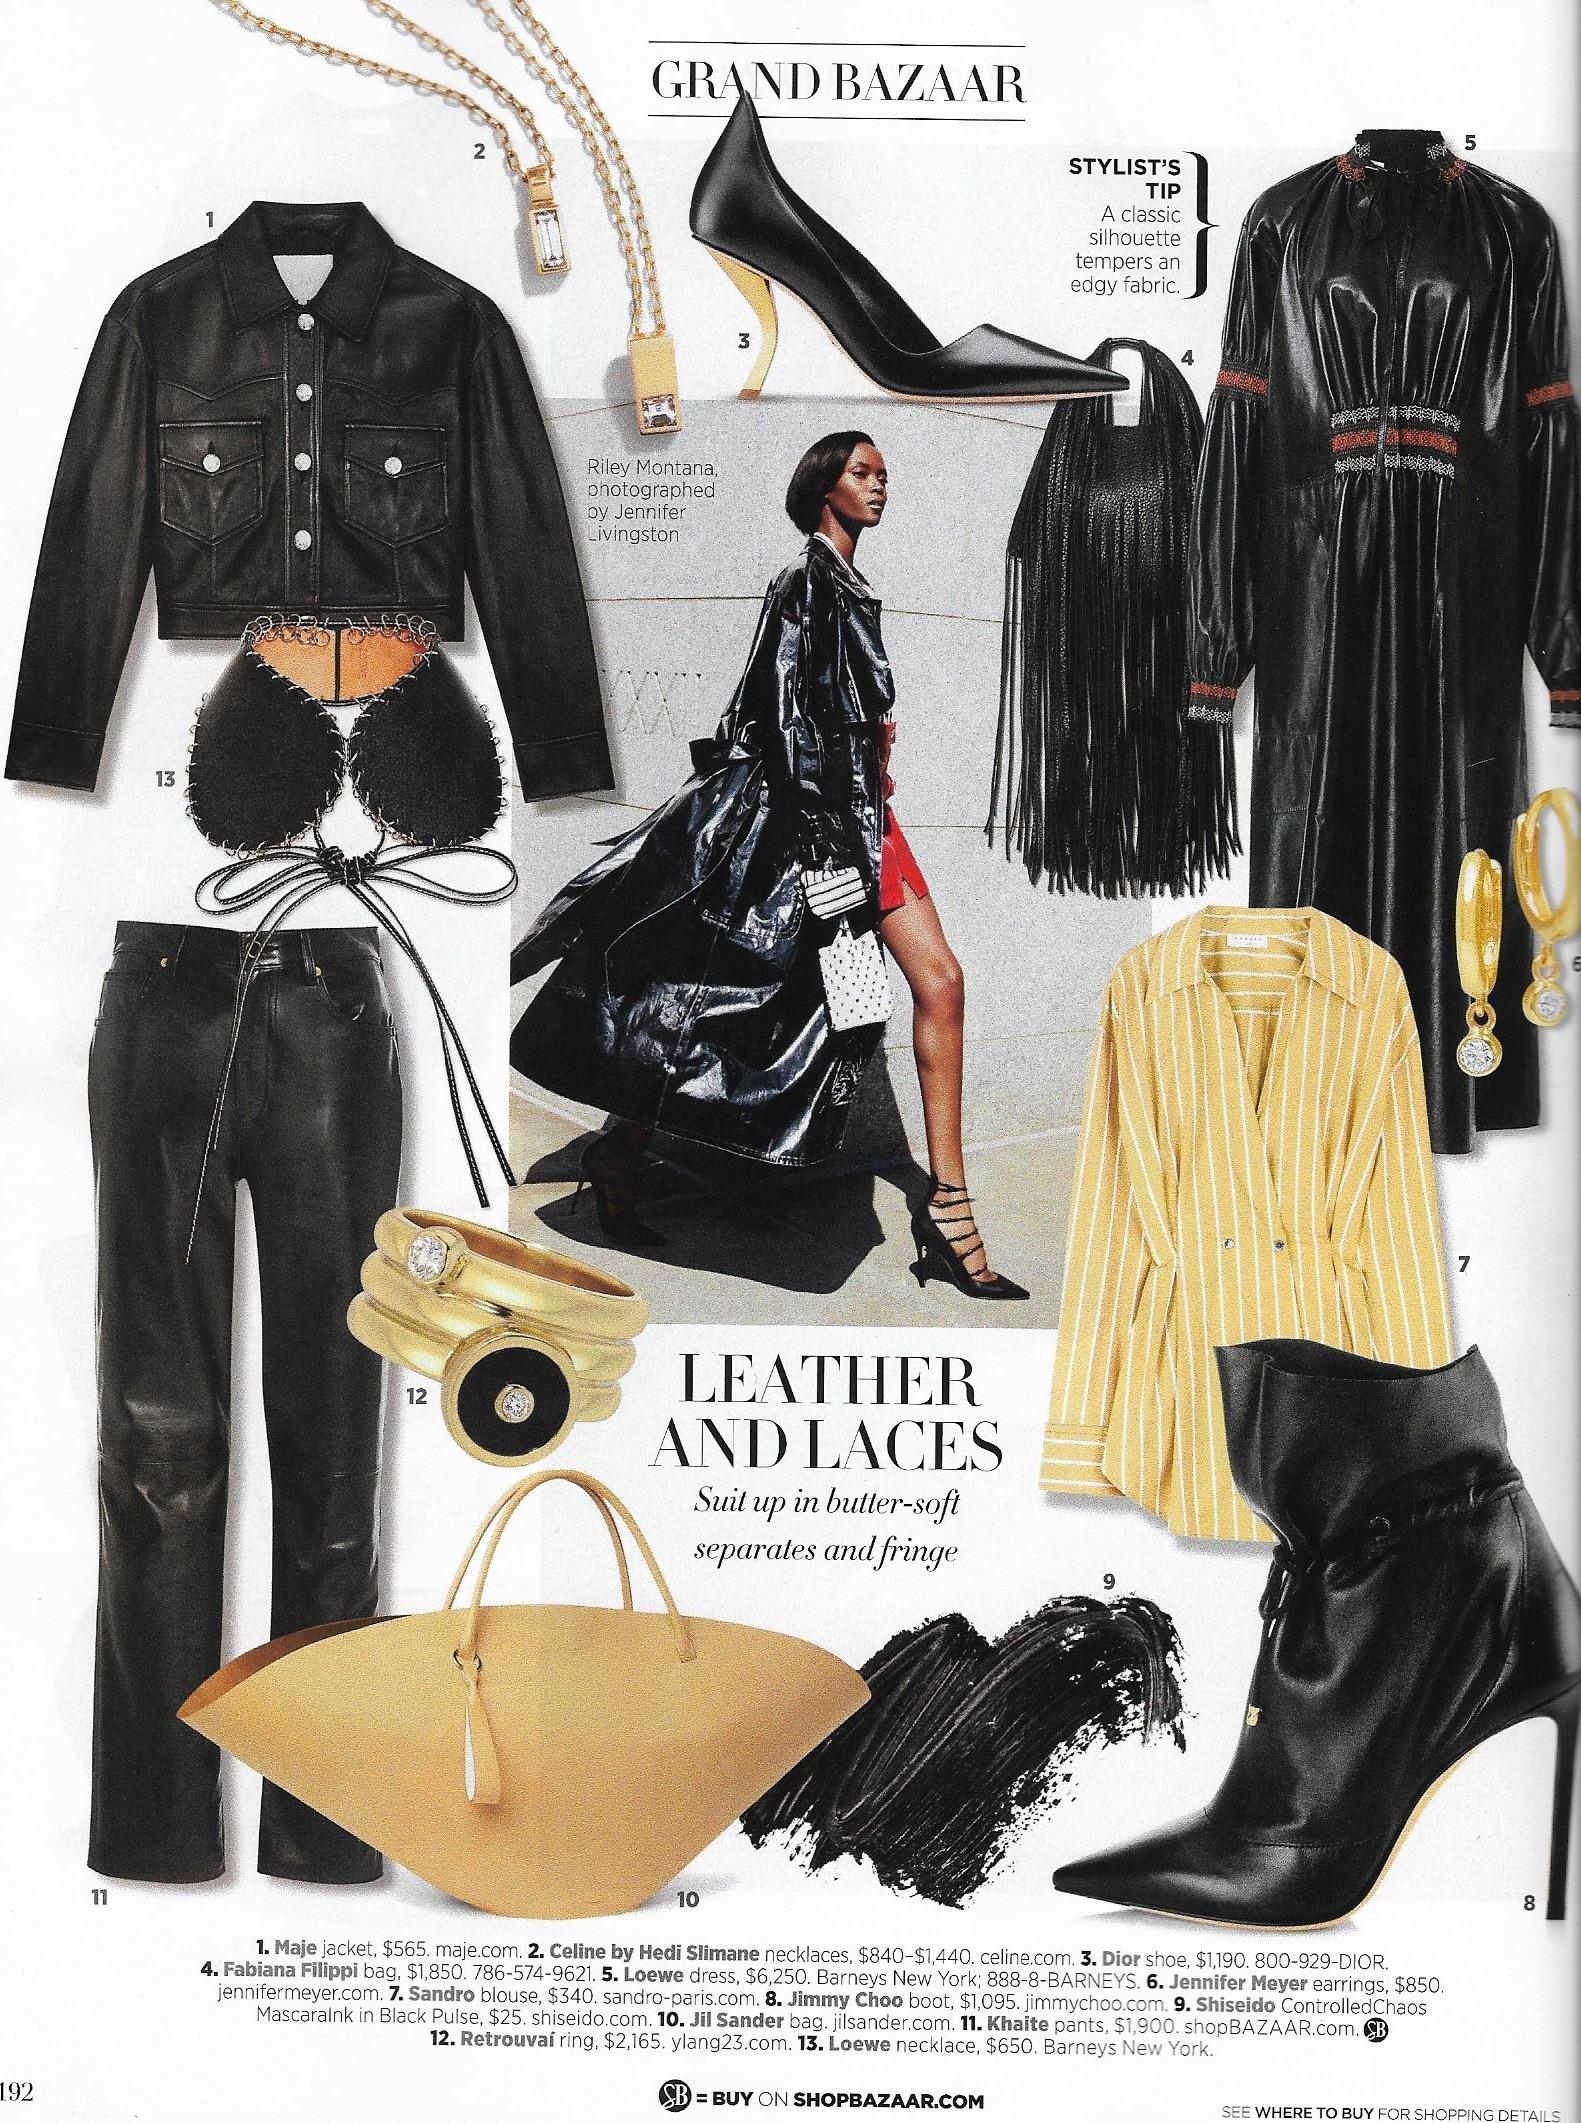 Retrouvaí in Harper's Bazaar